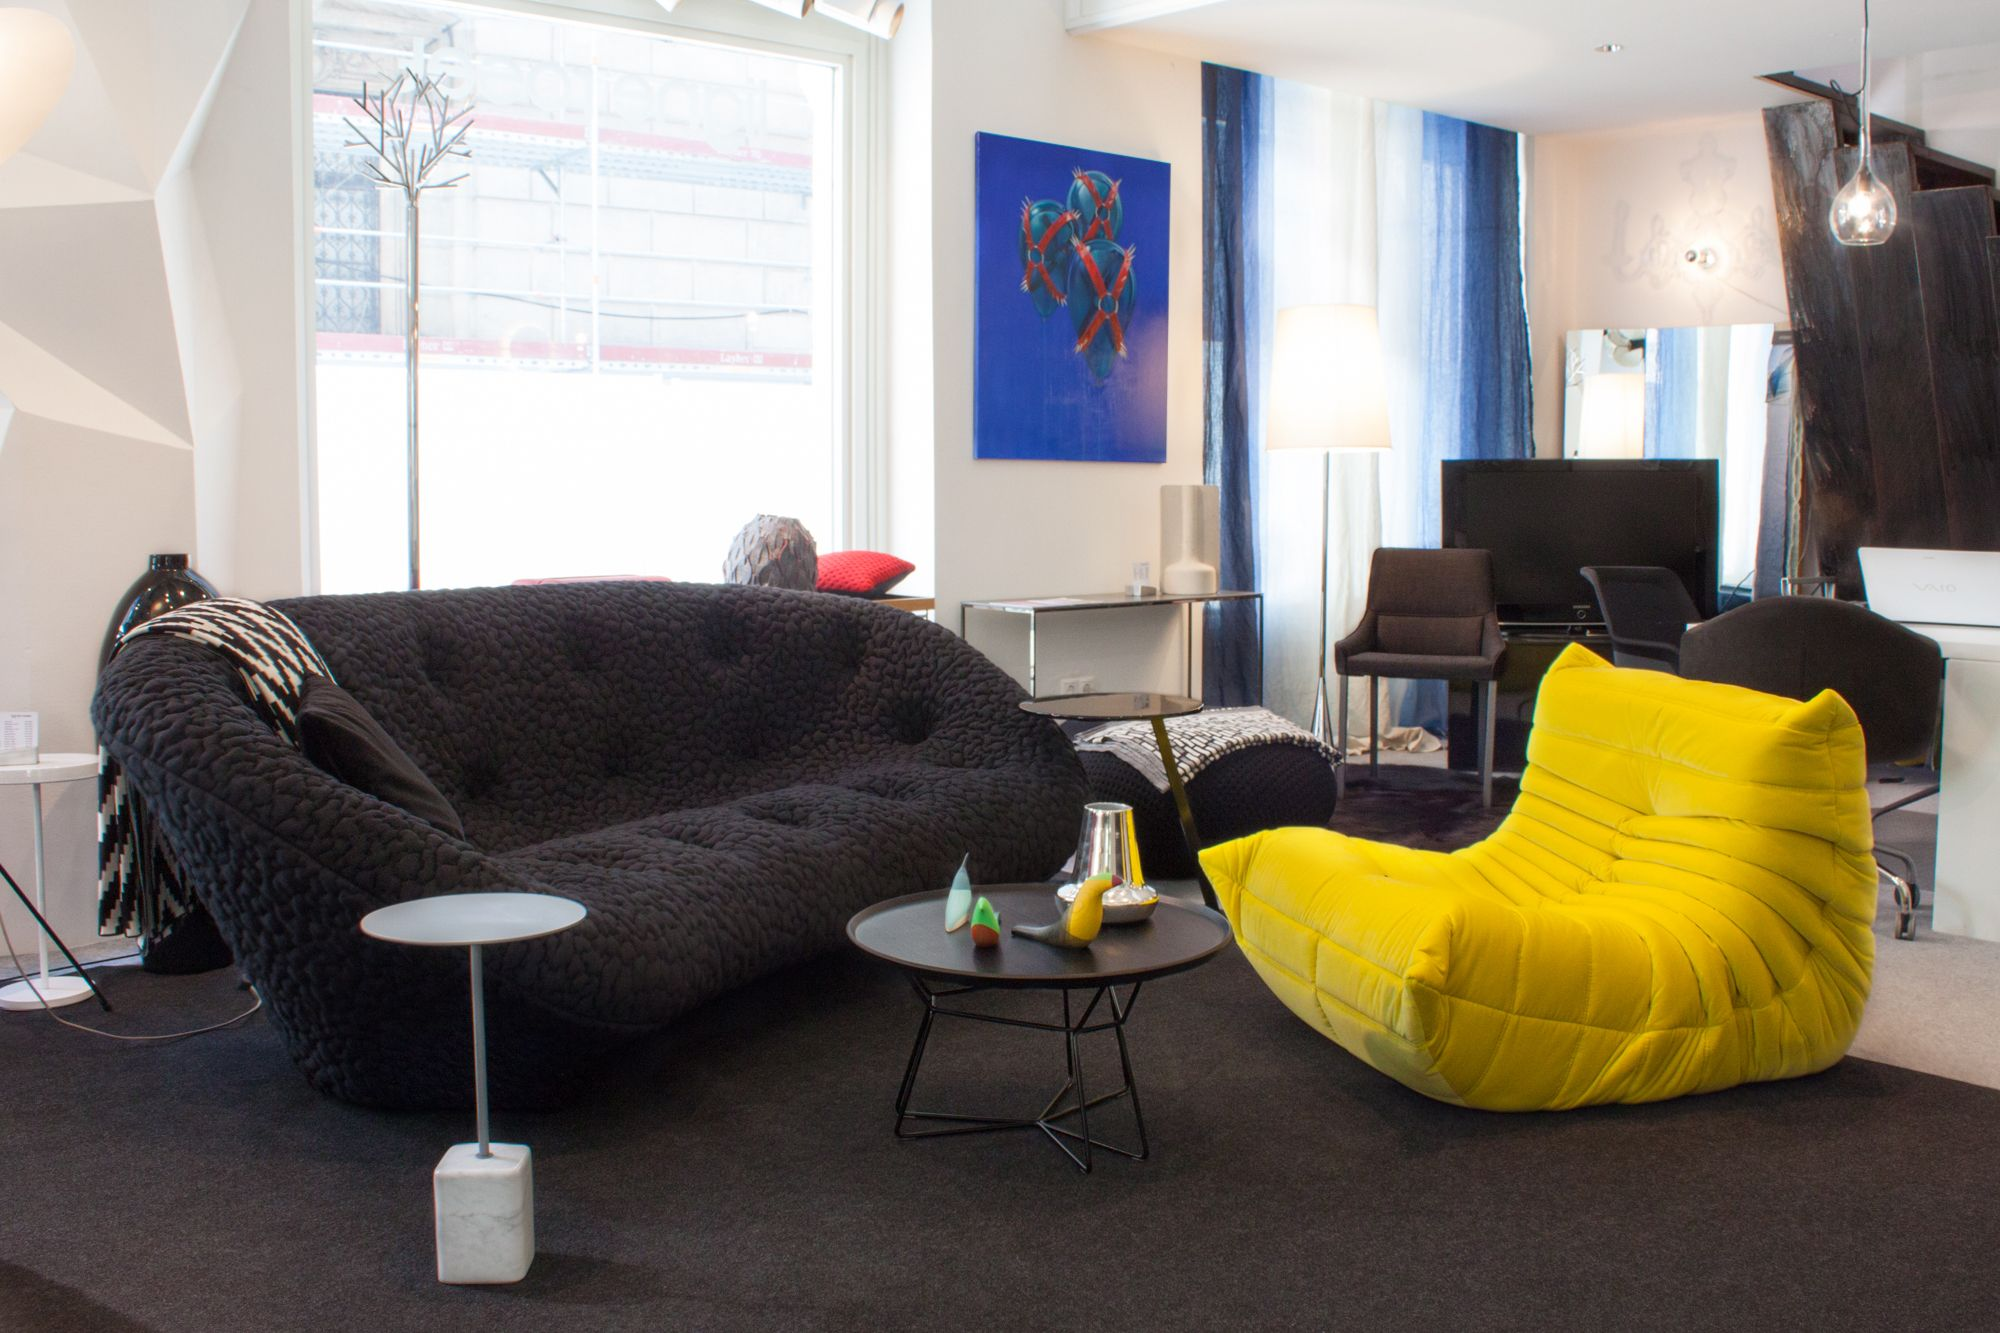 Sofa Ploum Design By Ronan Erwan Bouroullec For Ligne Roset